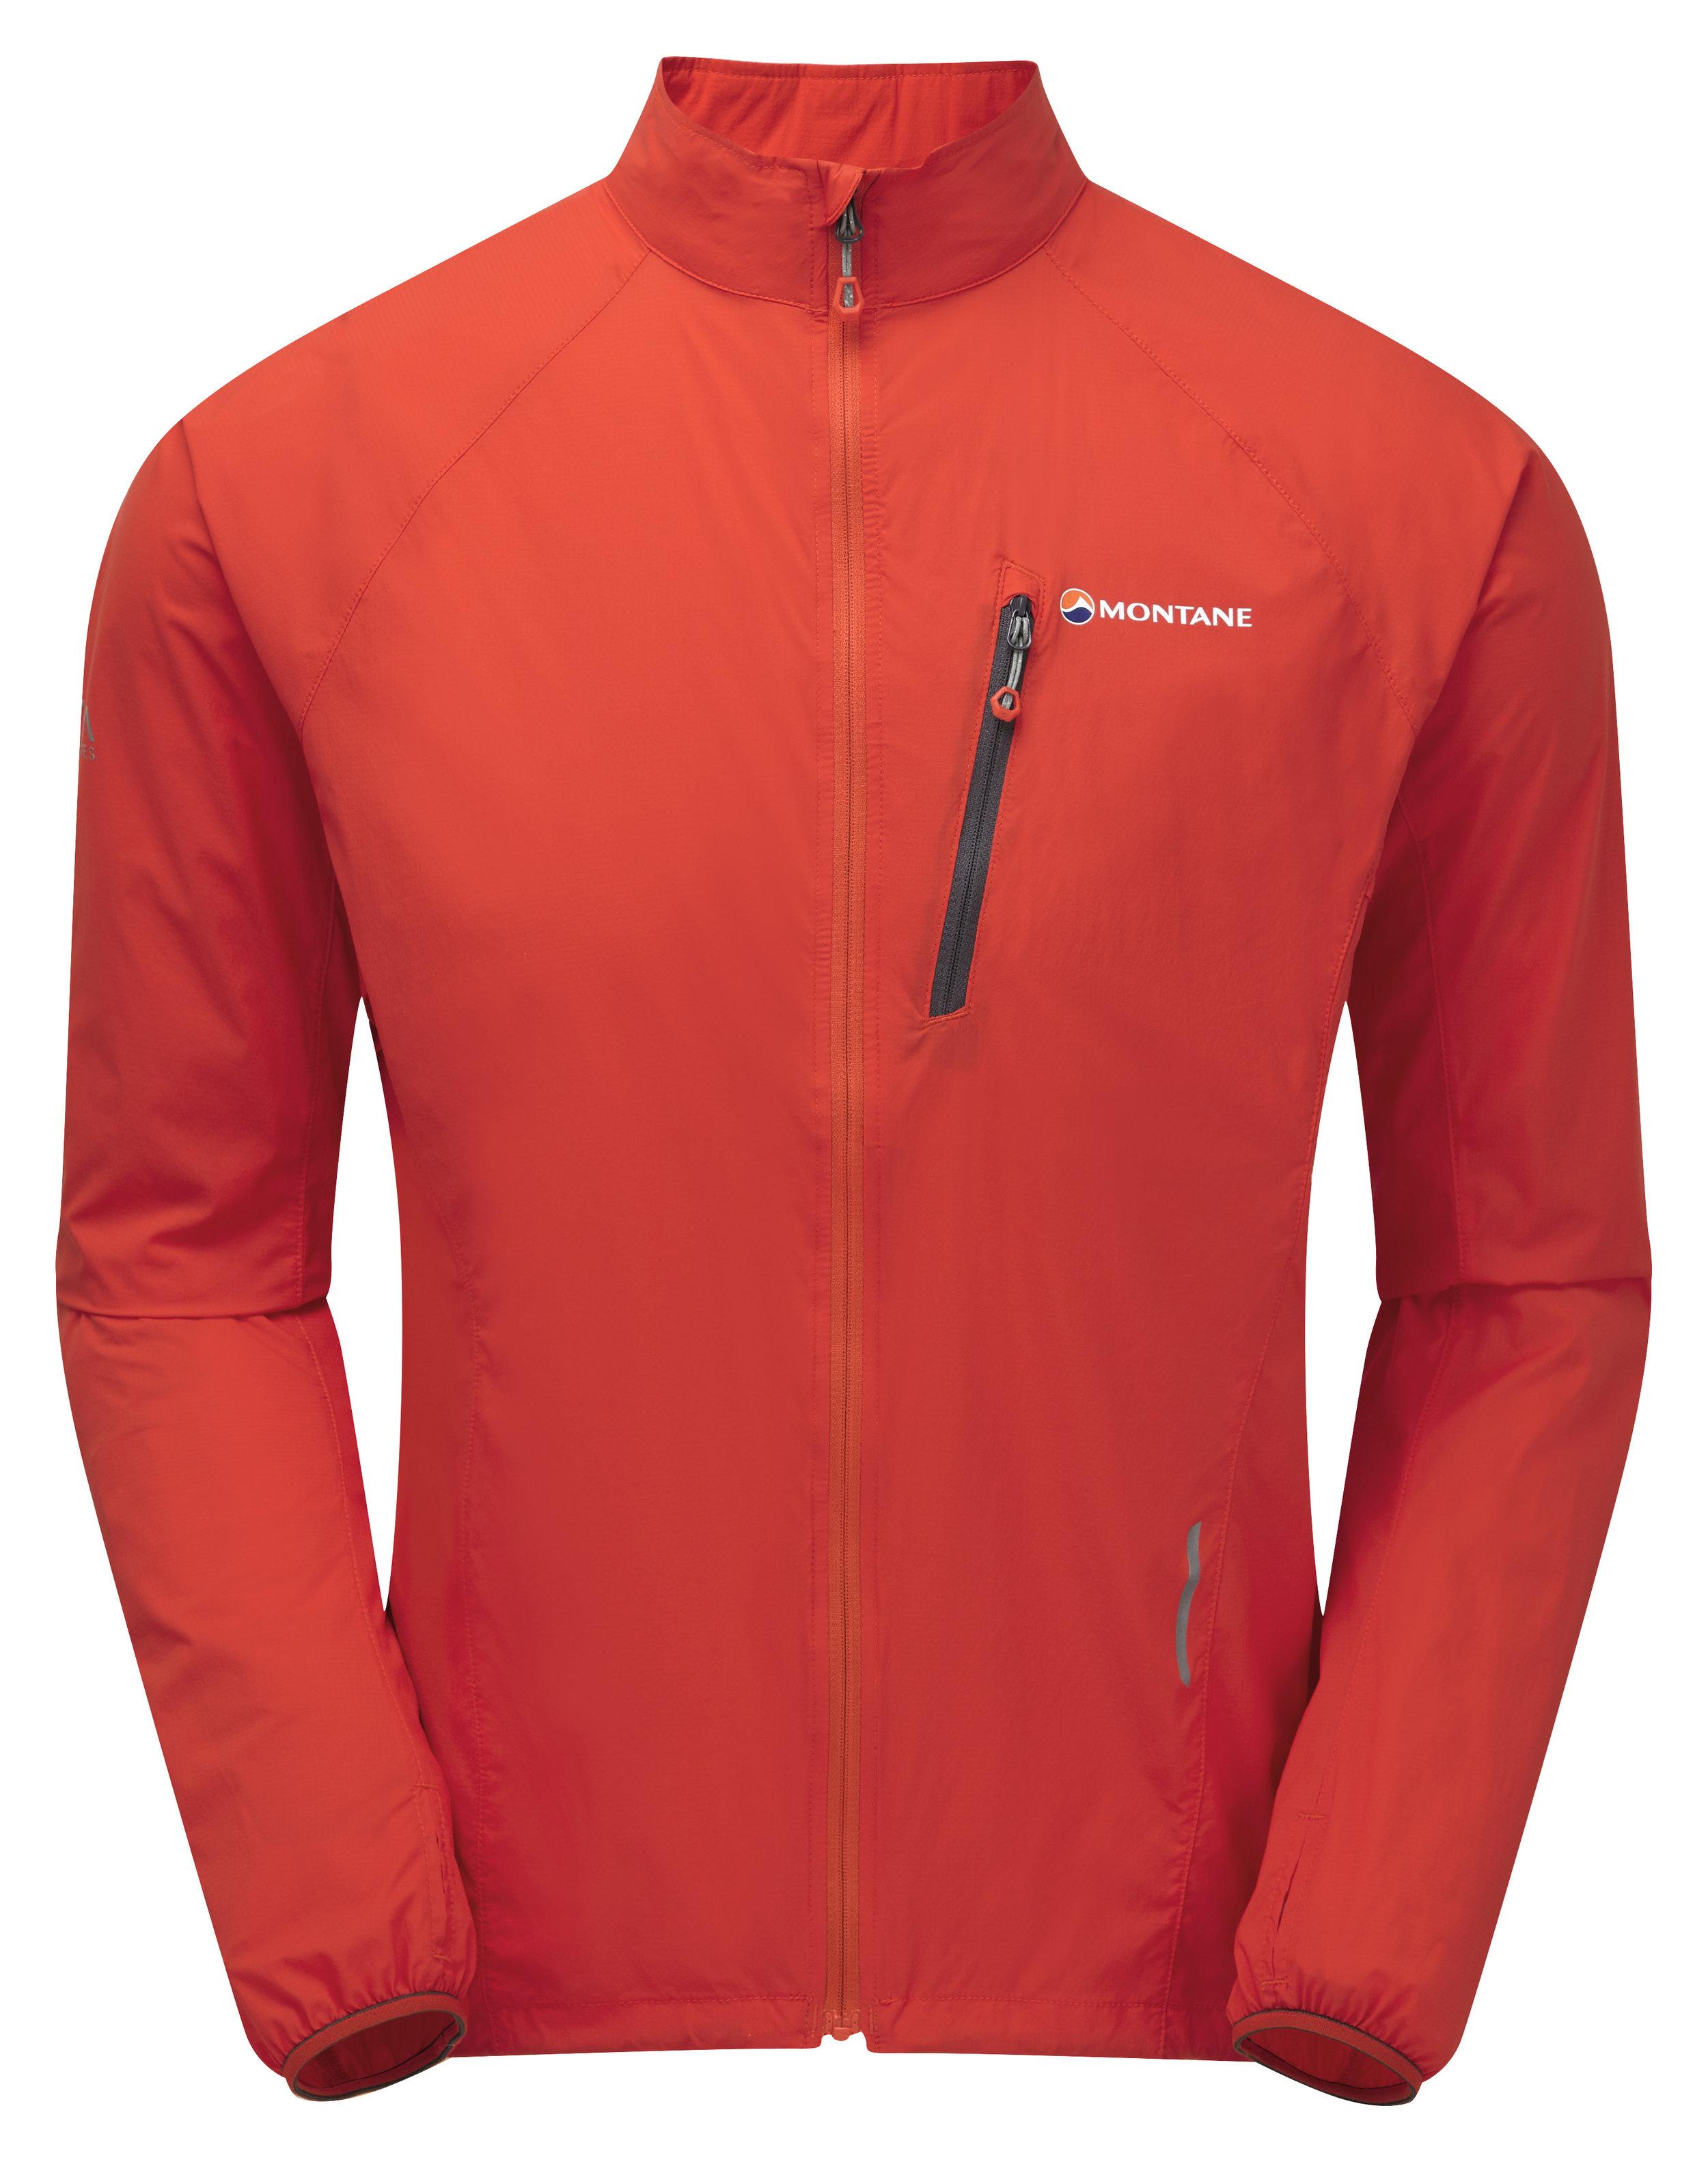 featherlite_trail_jacket_flag_red.jpg